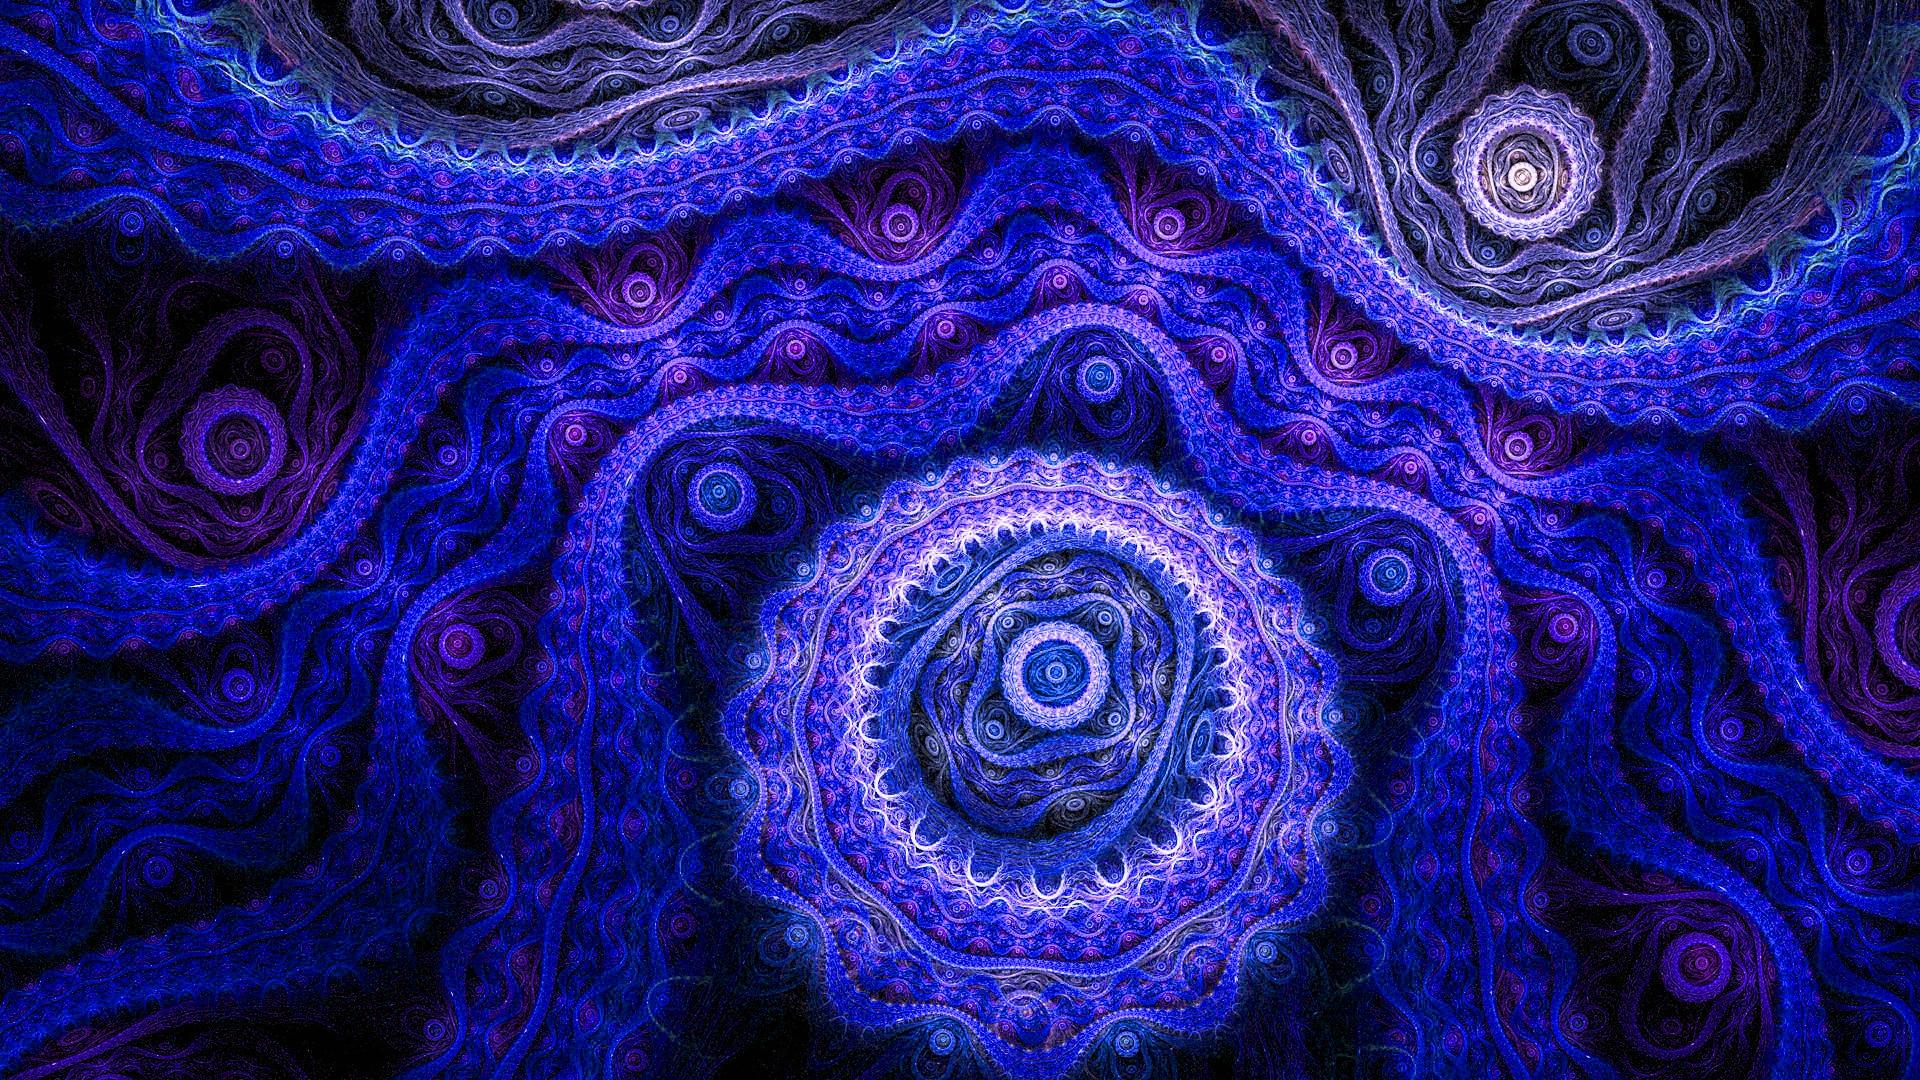 Dark Abstract Artwork Purple Violet Symmetry Blue Pattern Circle Kaleidoscope ART Textile Computer Wallpaper Fractal Art